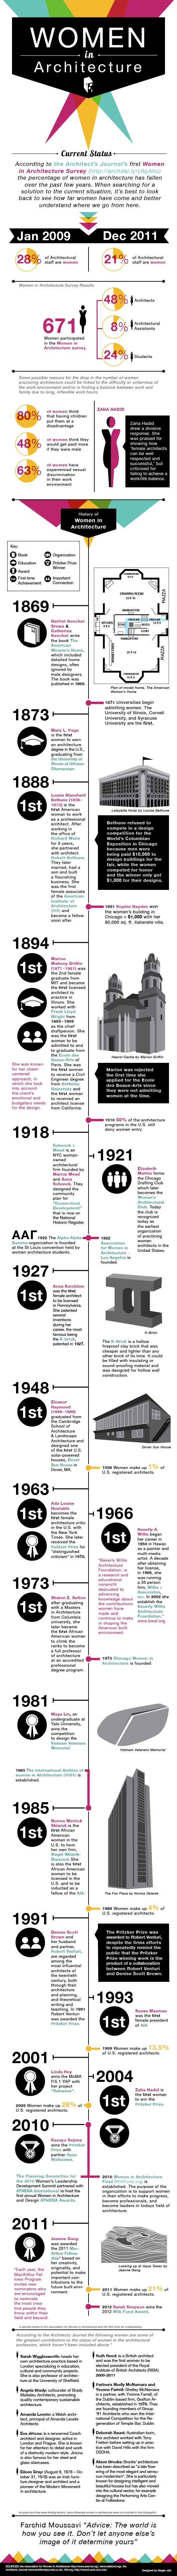 2012-03-20-infographic.jpg